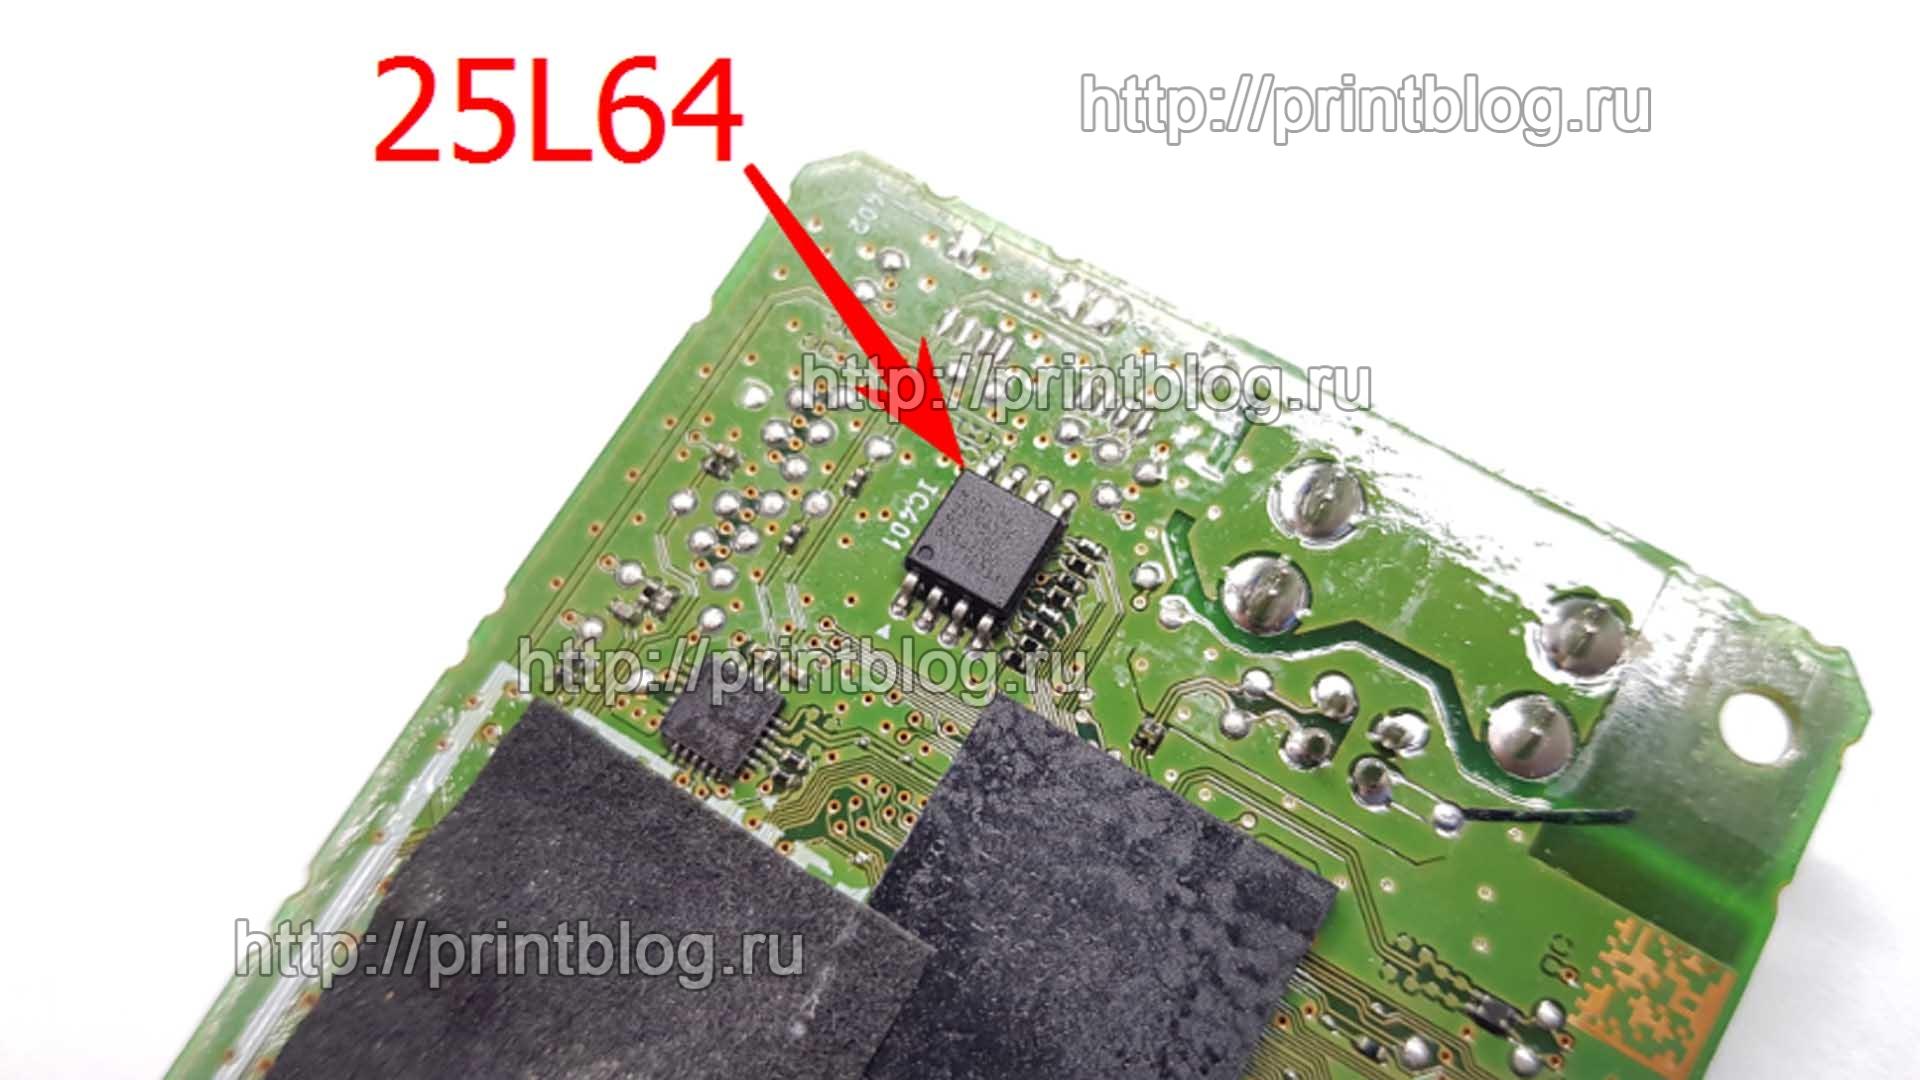 Сброс памперса Canon PIXMA MG3040 (MG3000) Ошибка 5B00 _33